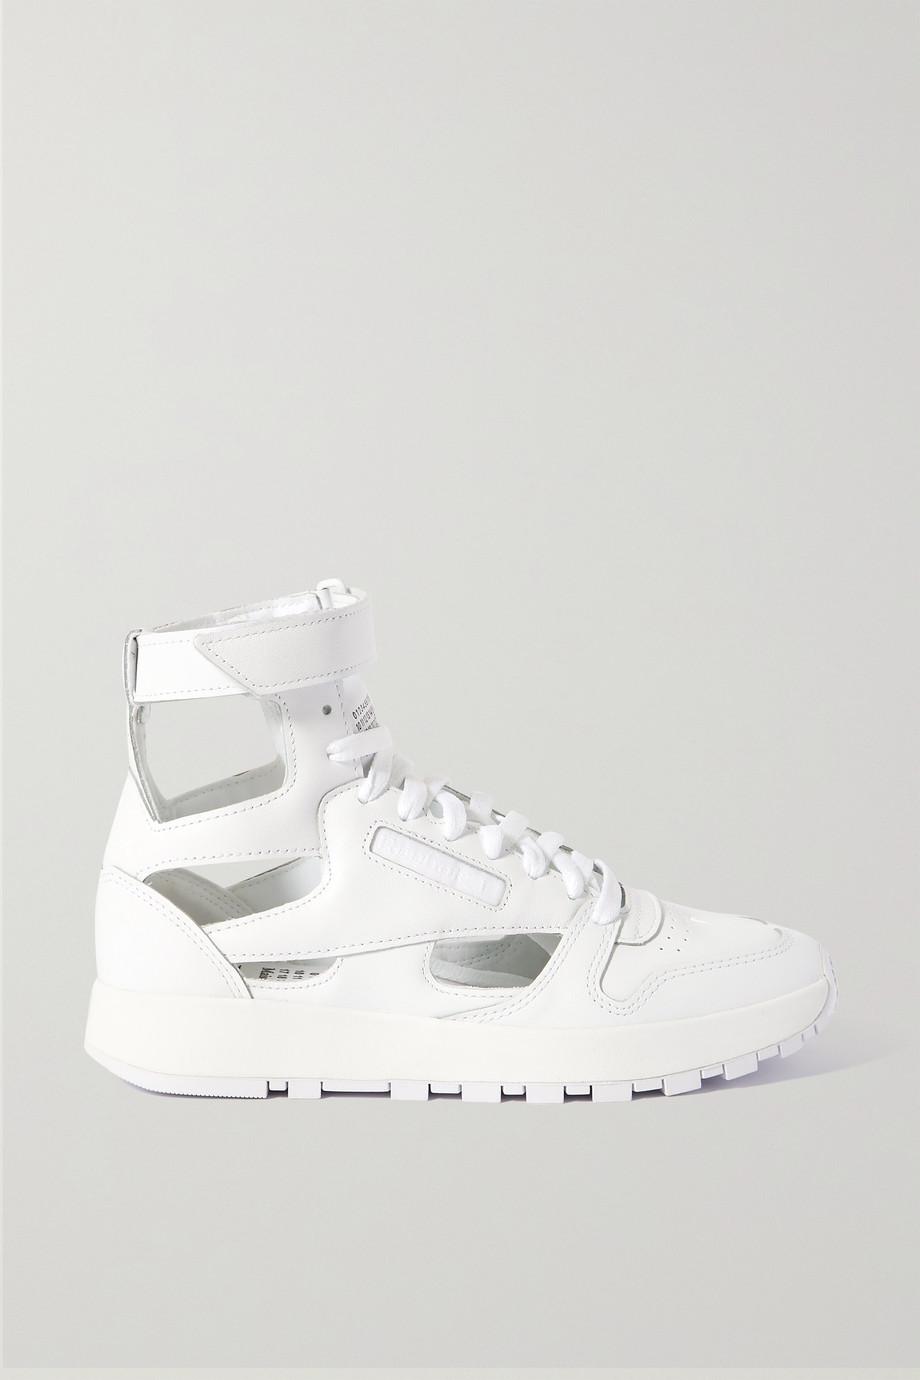 Maison Margiela + Reebok cutout split-toe leather high-top sneakers